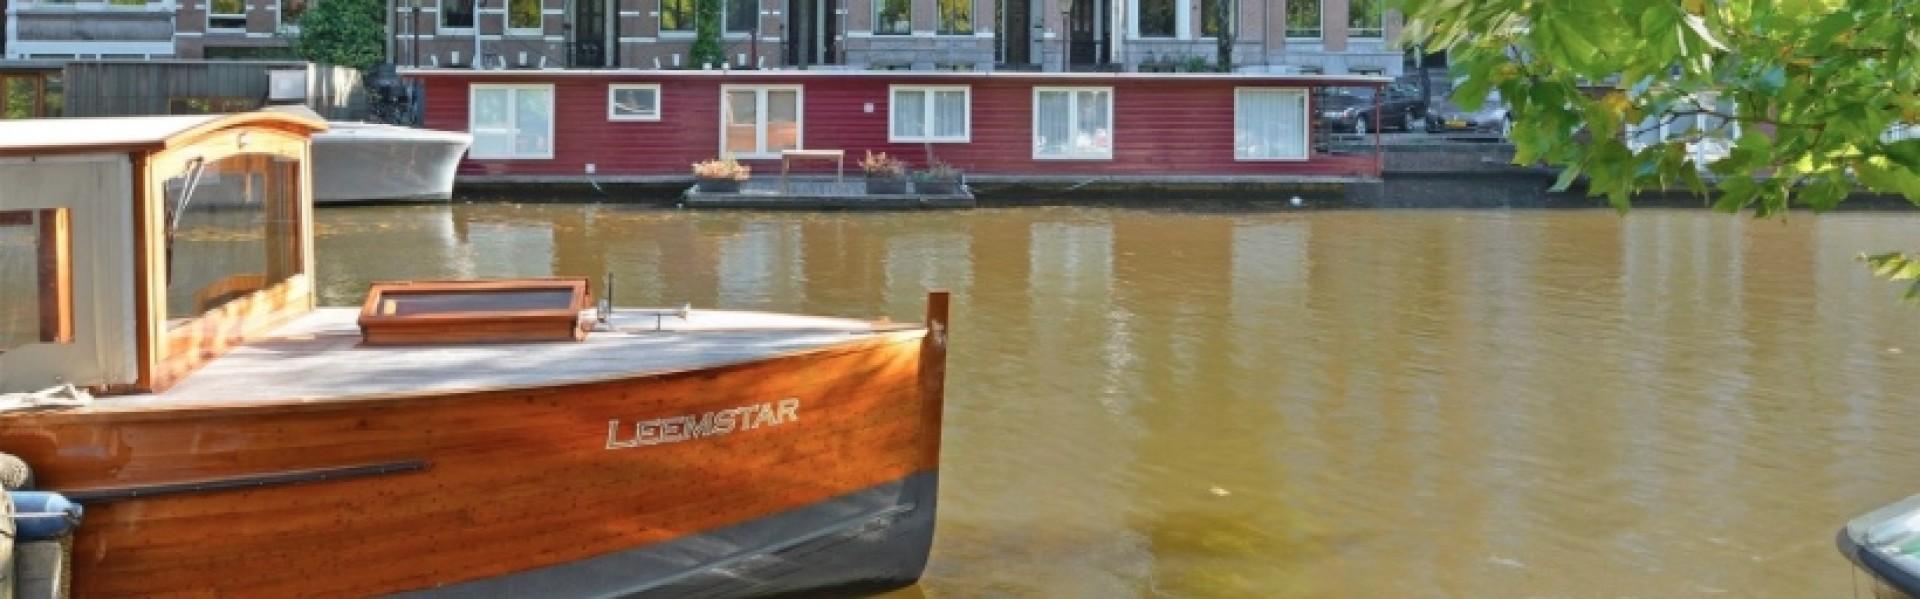 Leemstar Amsterdam